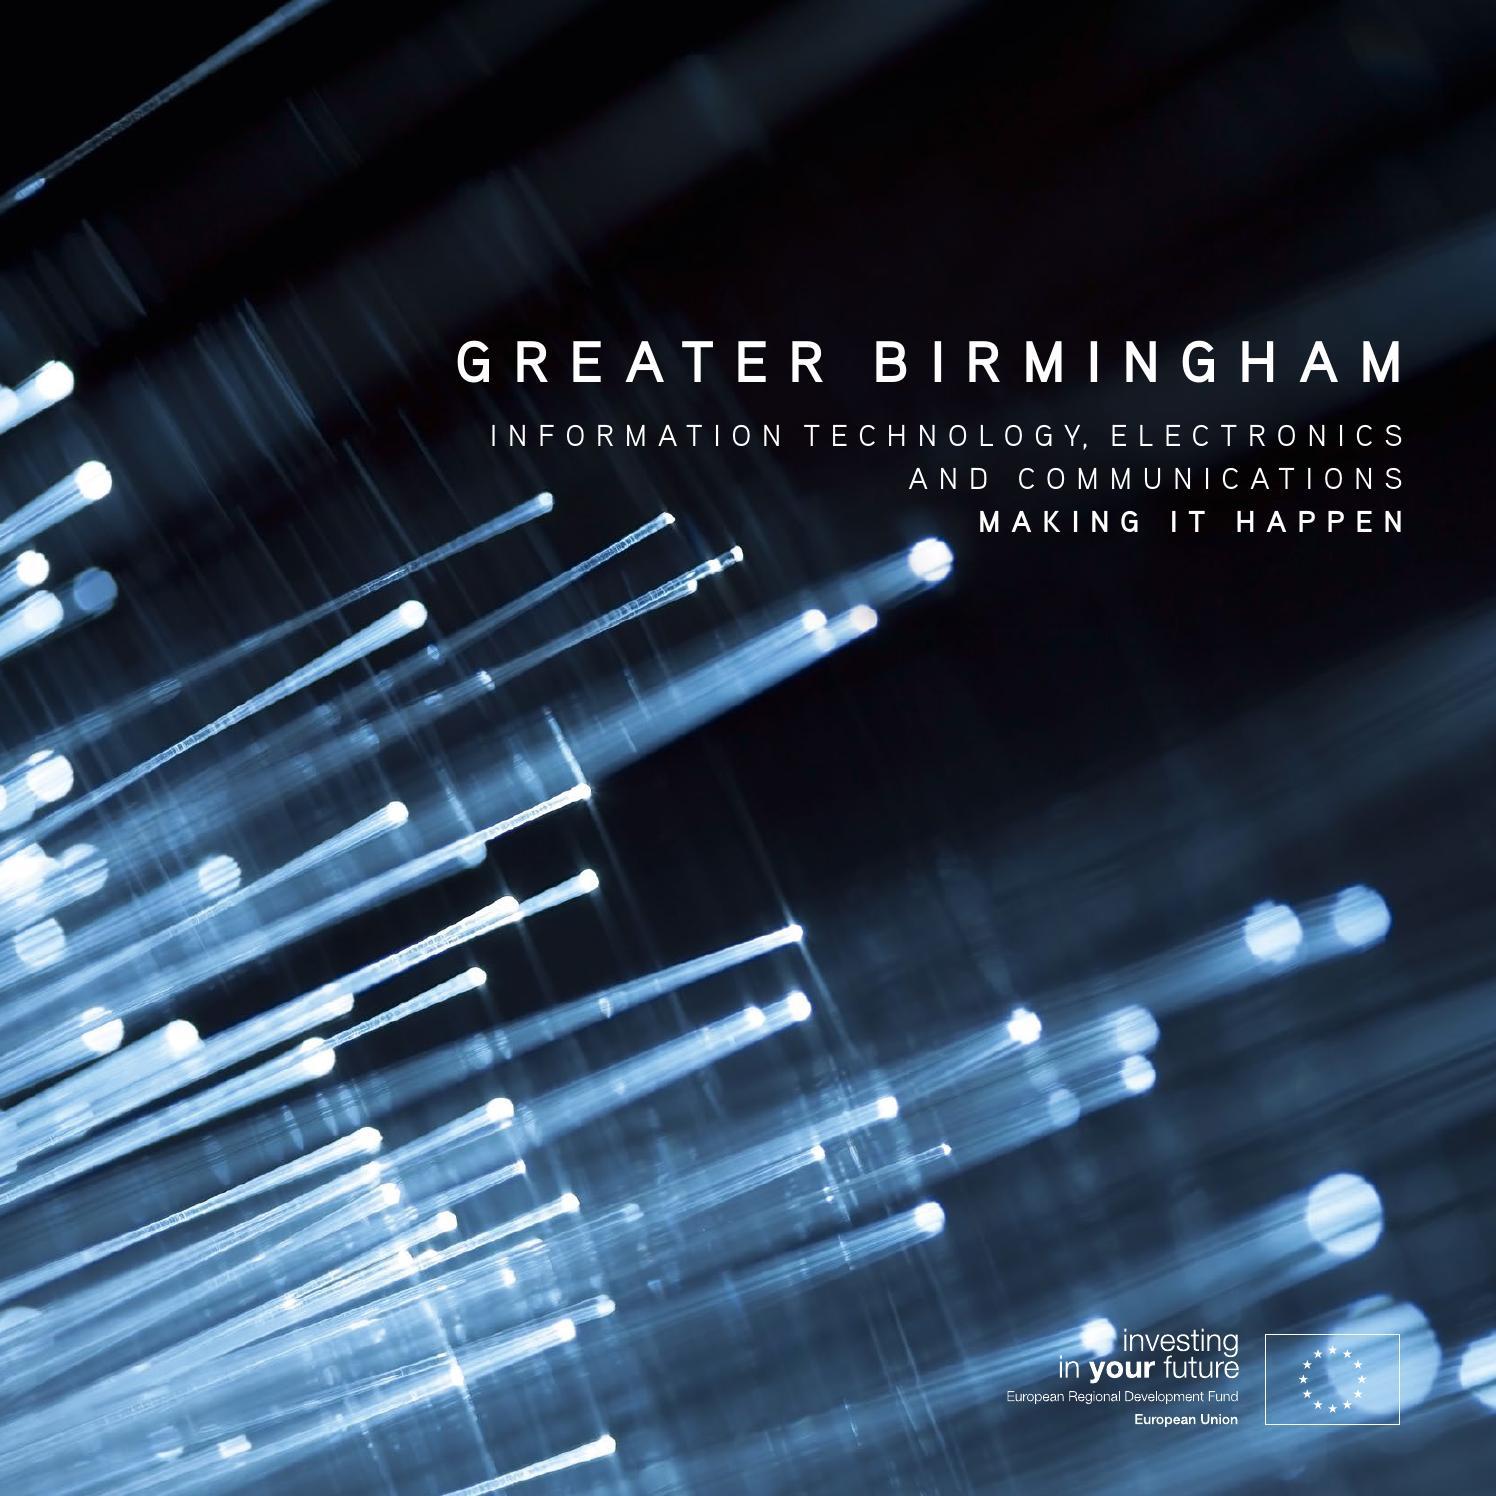 Greater Birmingham Information Technology, Electronics & Communications 2015